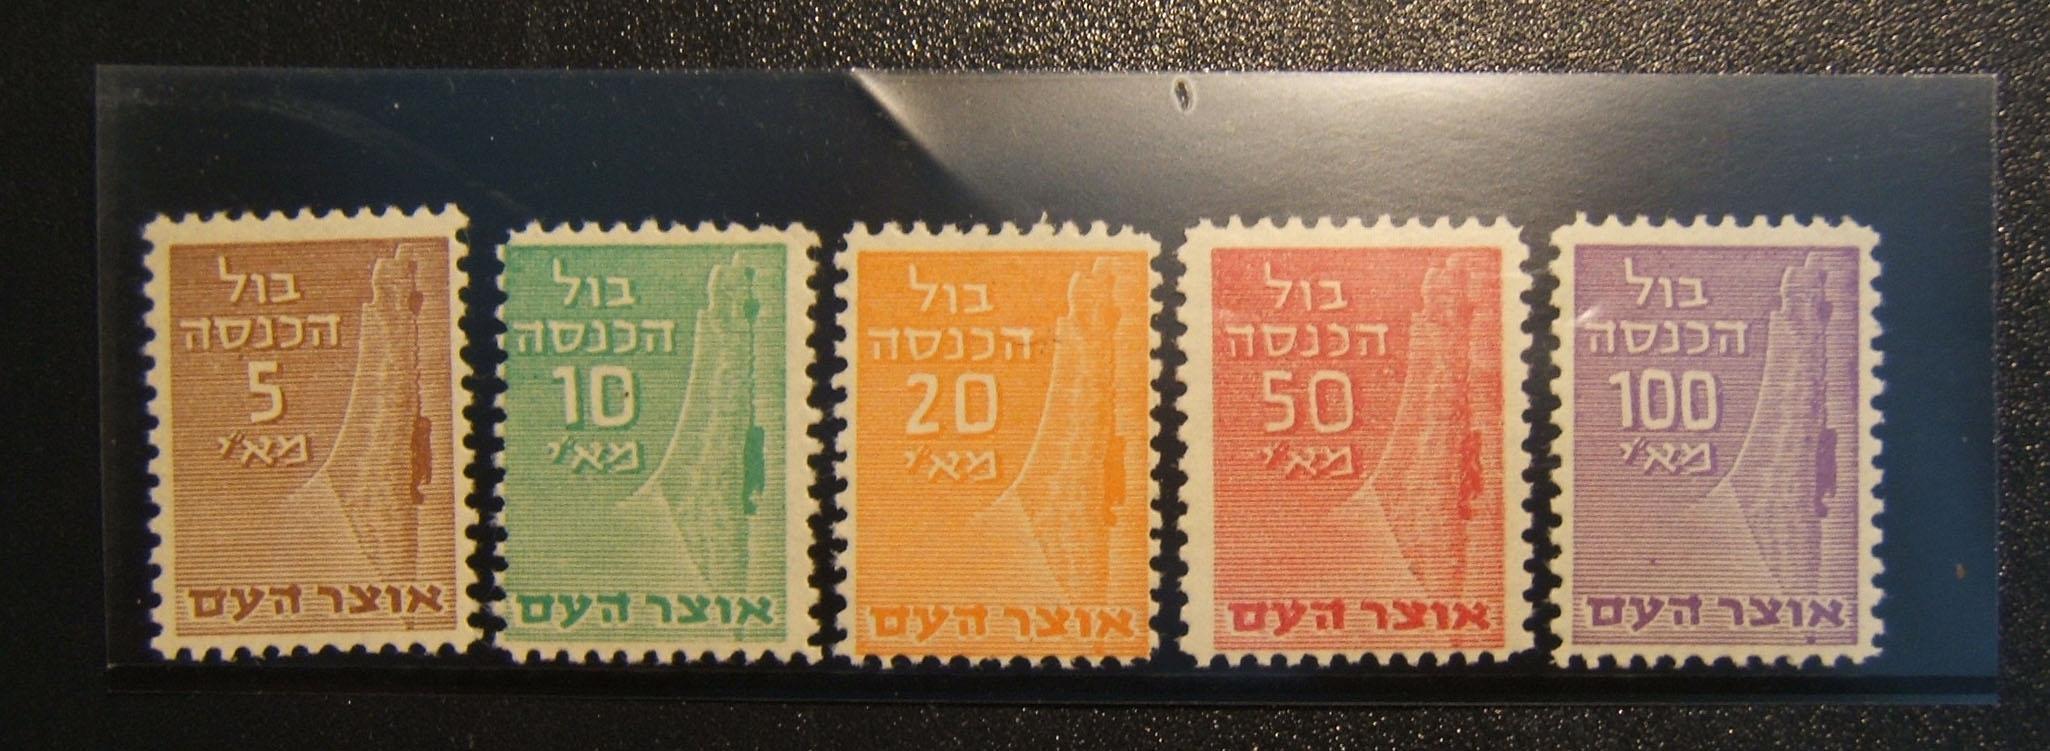 Otzar Haam' Jerusalem, Belagerung-Steuermarken (1948, Ballen 1-5), komplettes Set, postfrisch